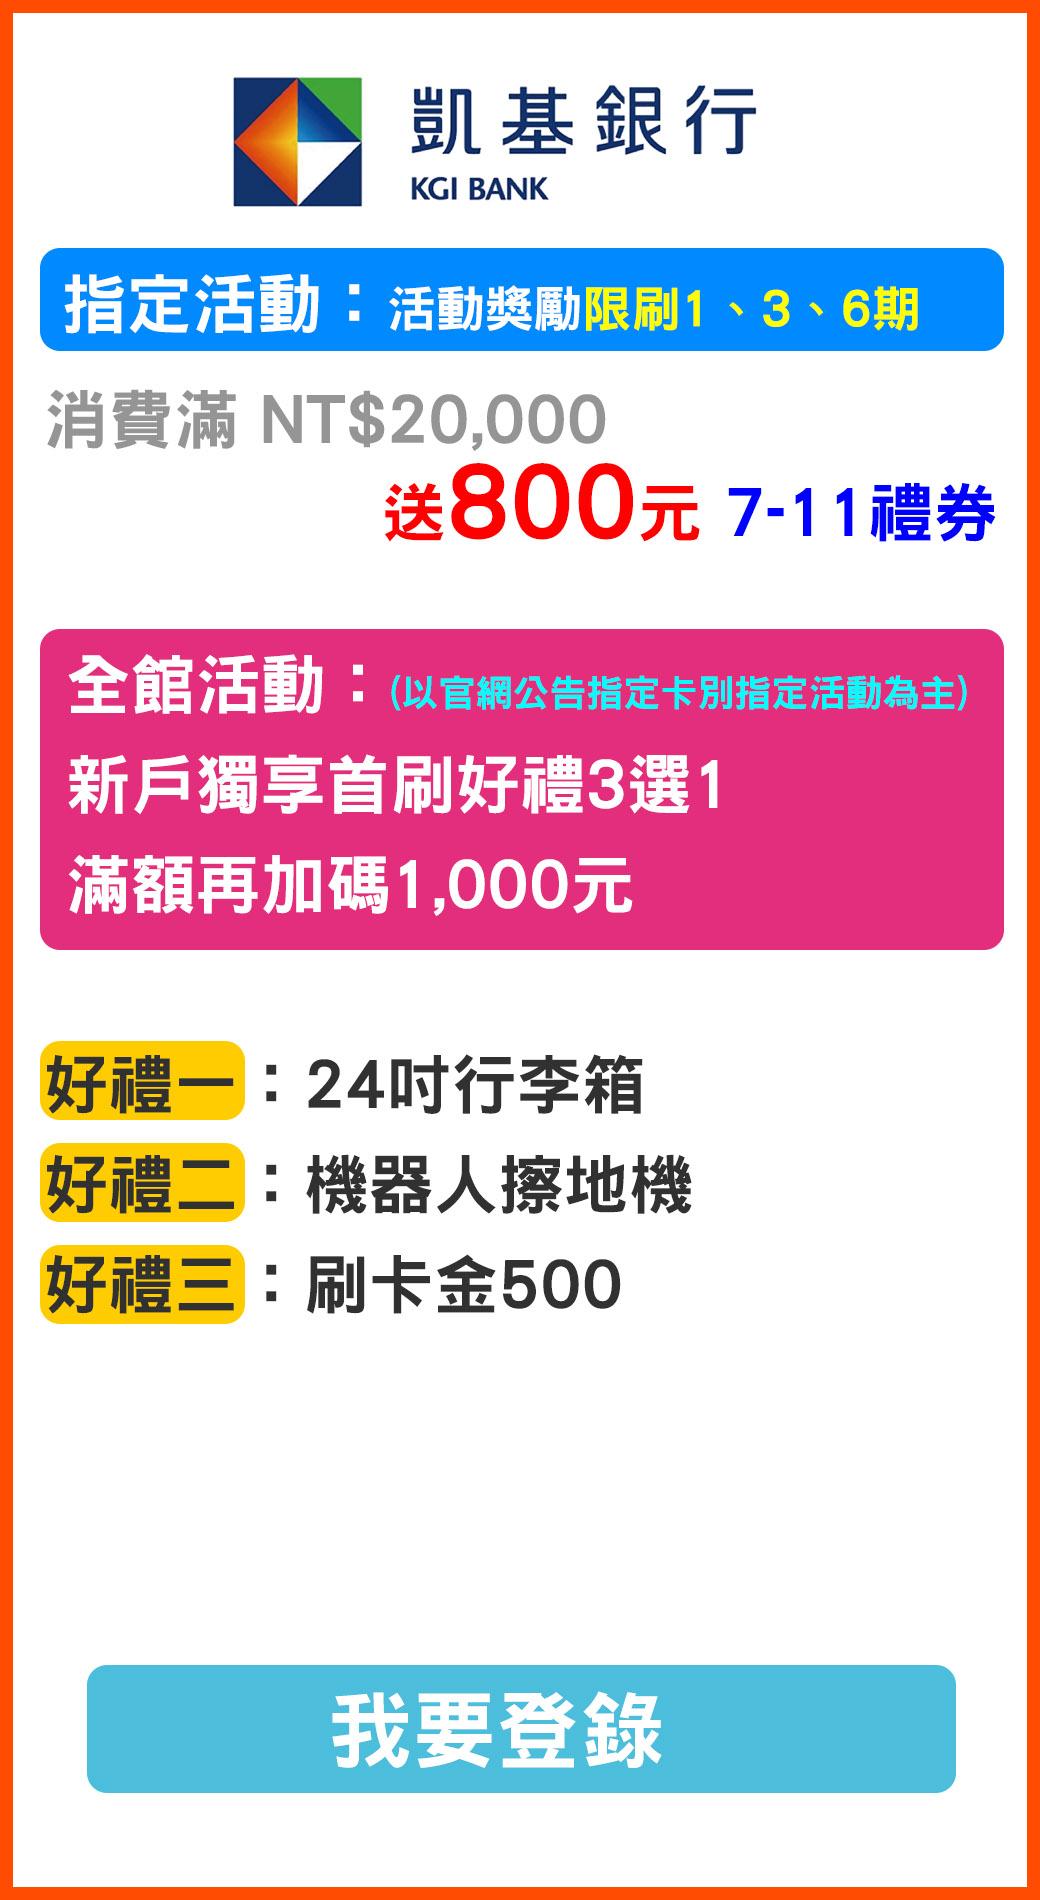 http://forum.sinya.com.tw/upload/attachment/2020/5efbfcfe4b5b95611.jpg